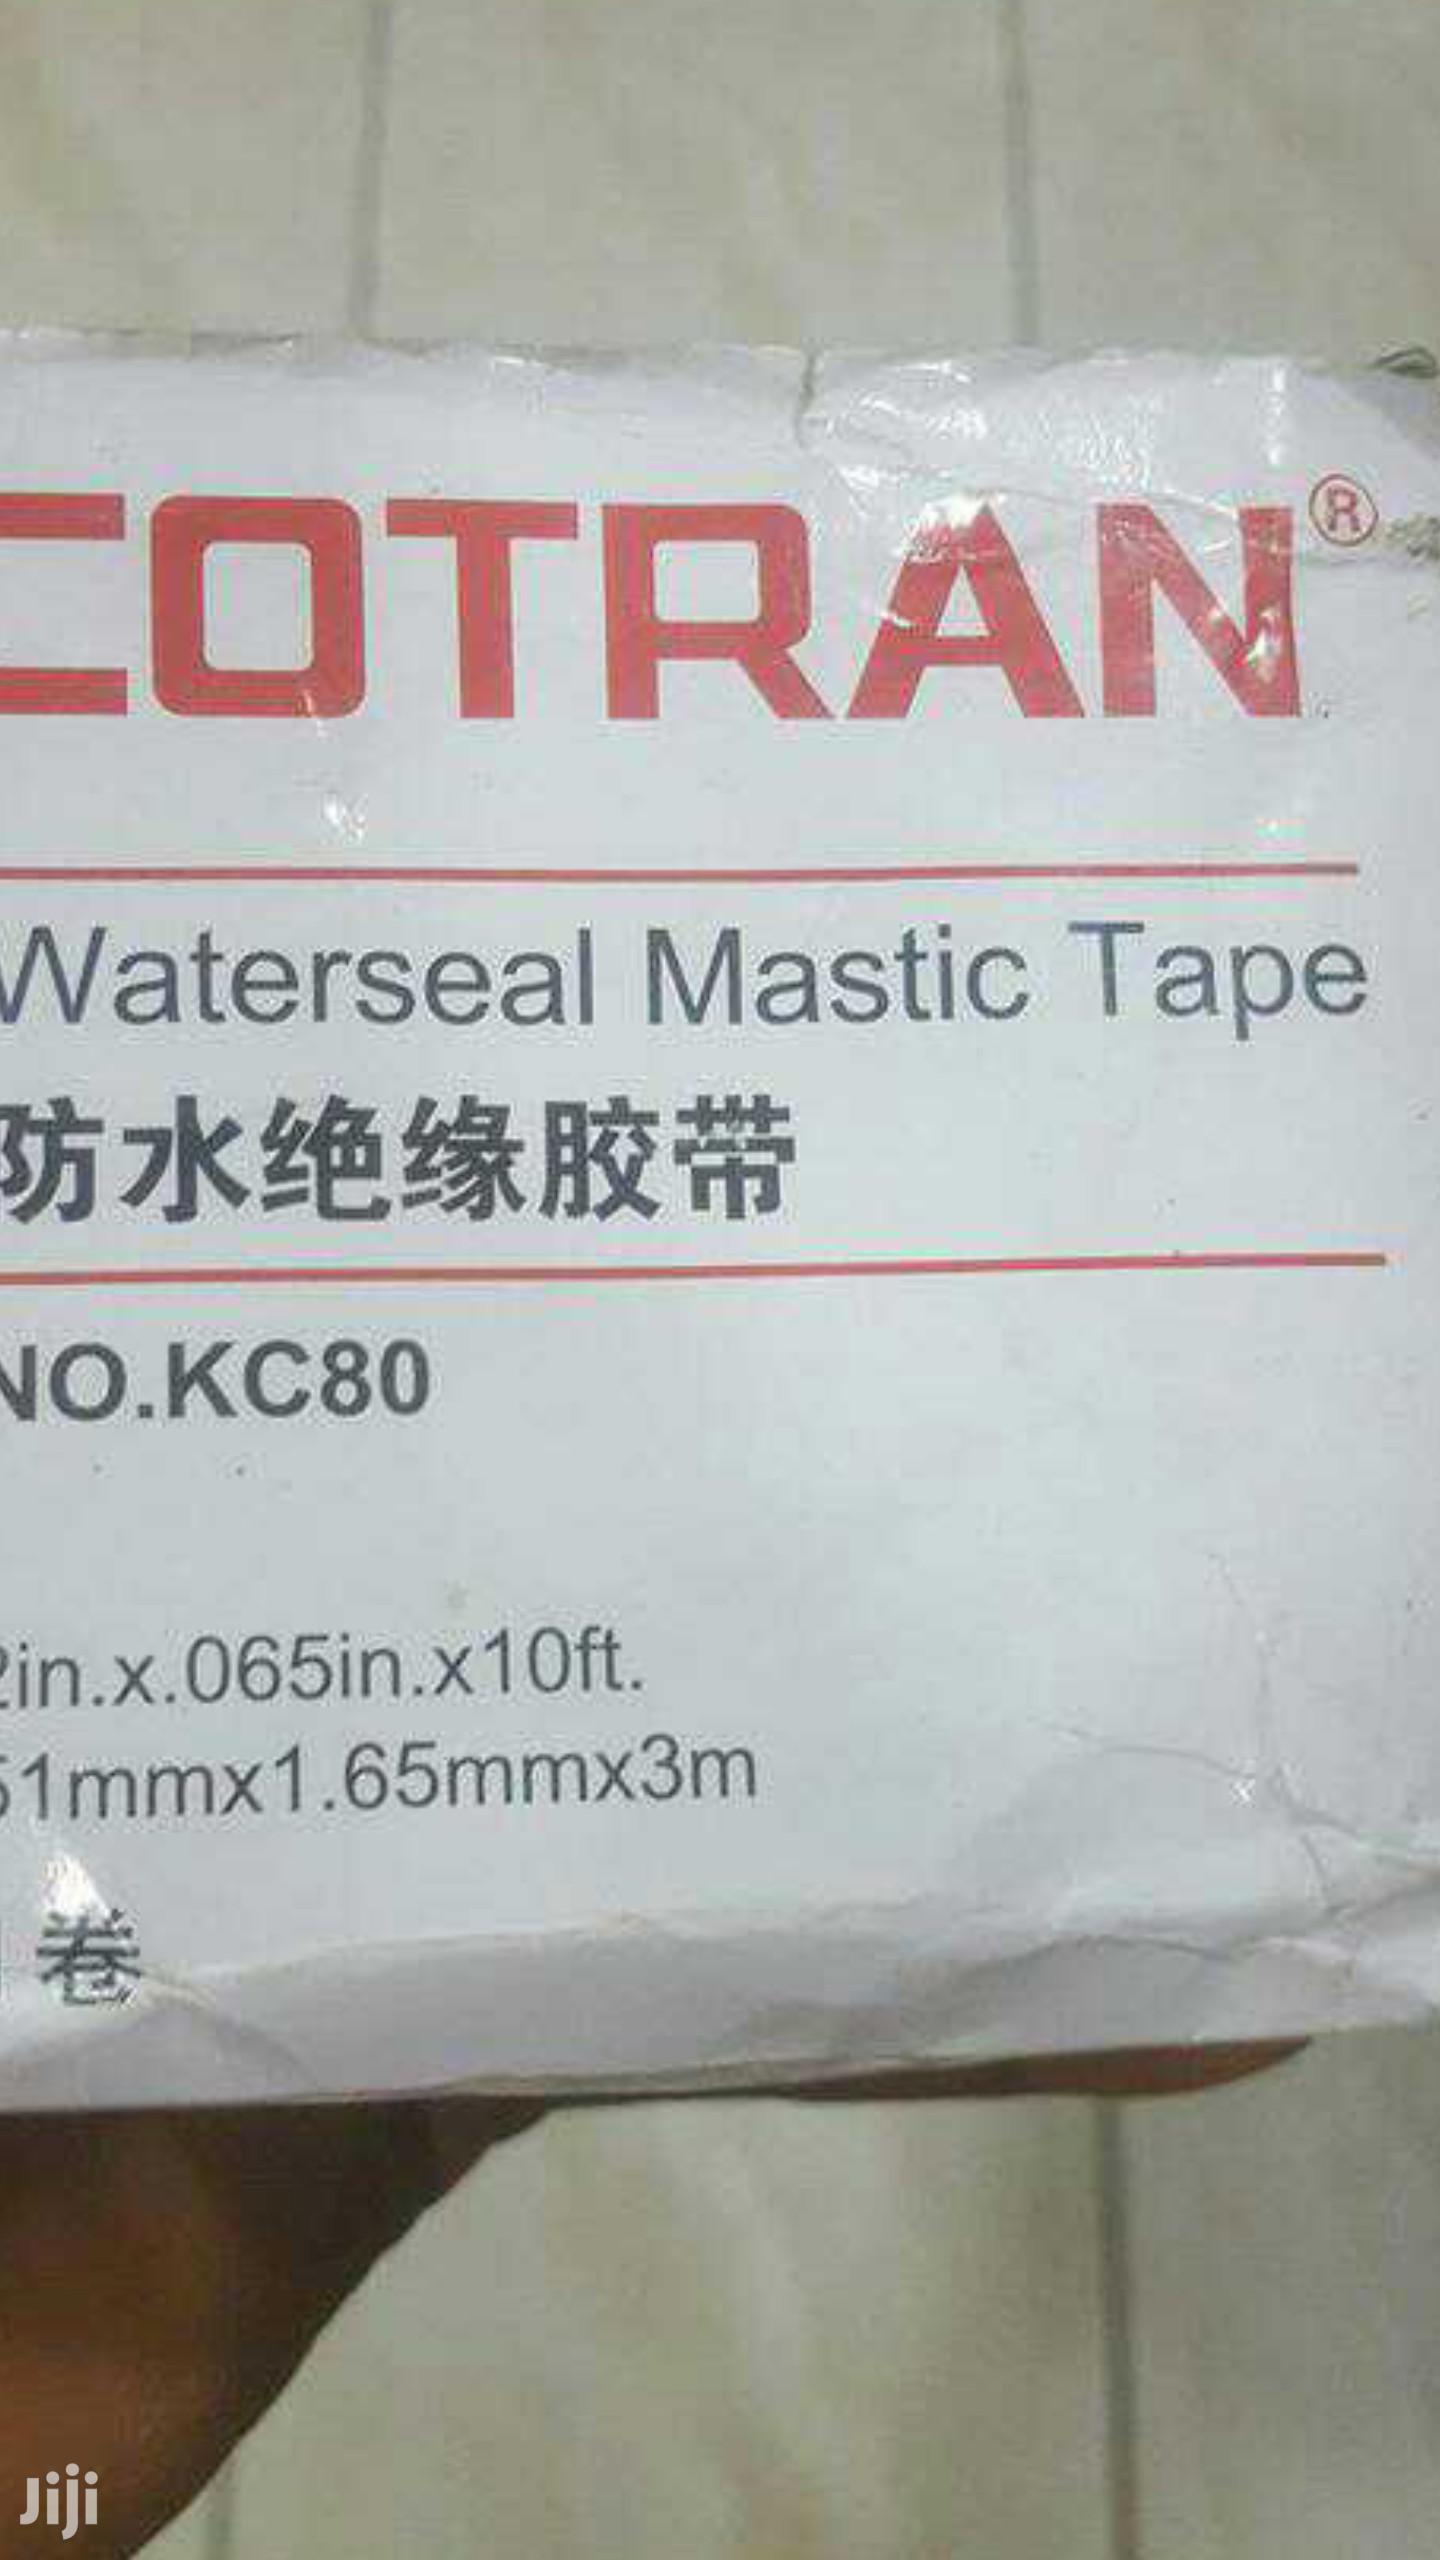 Archive: Mastic Tape